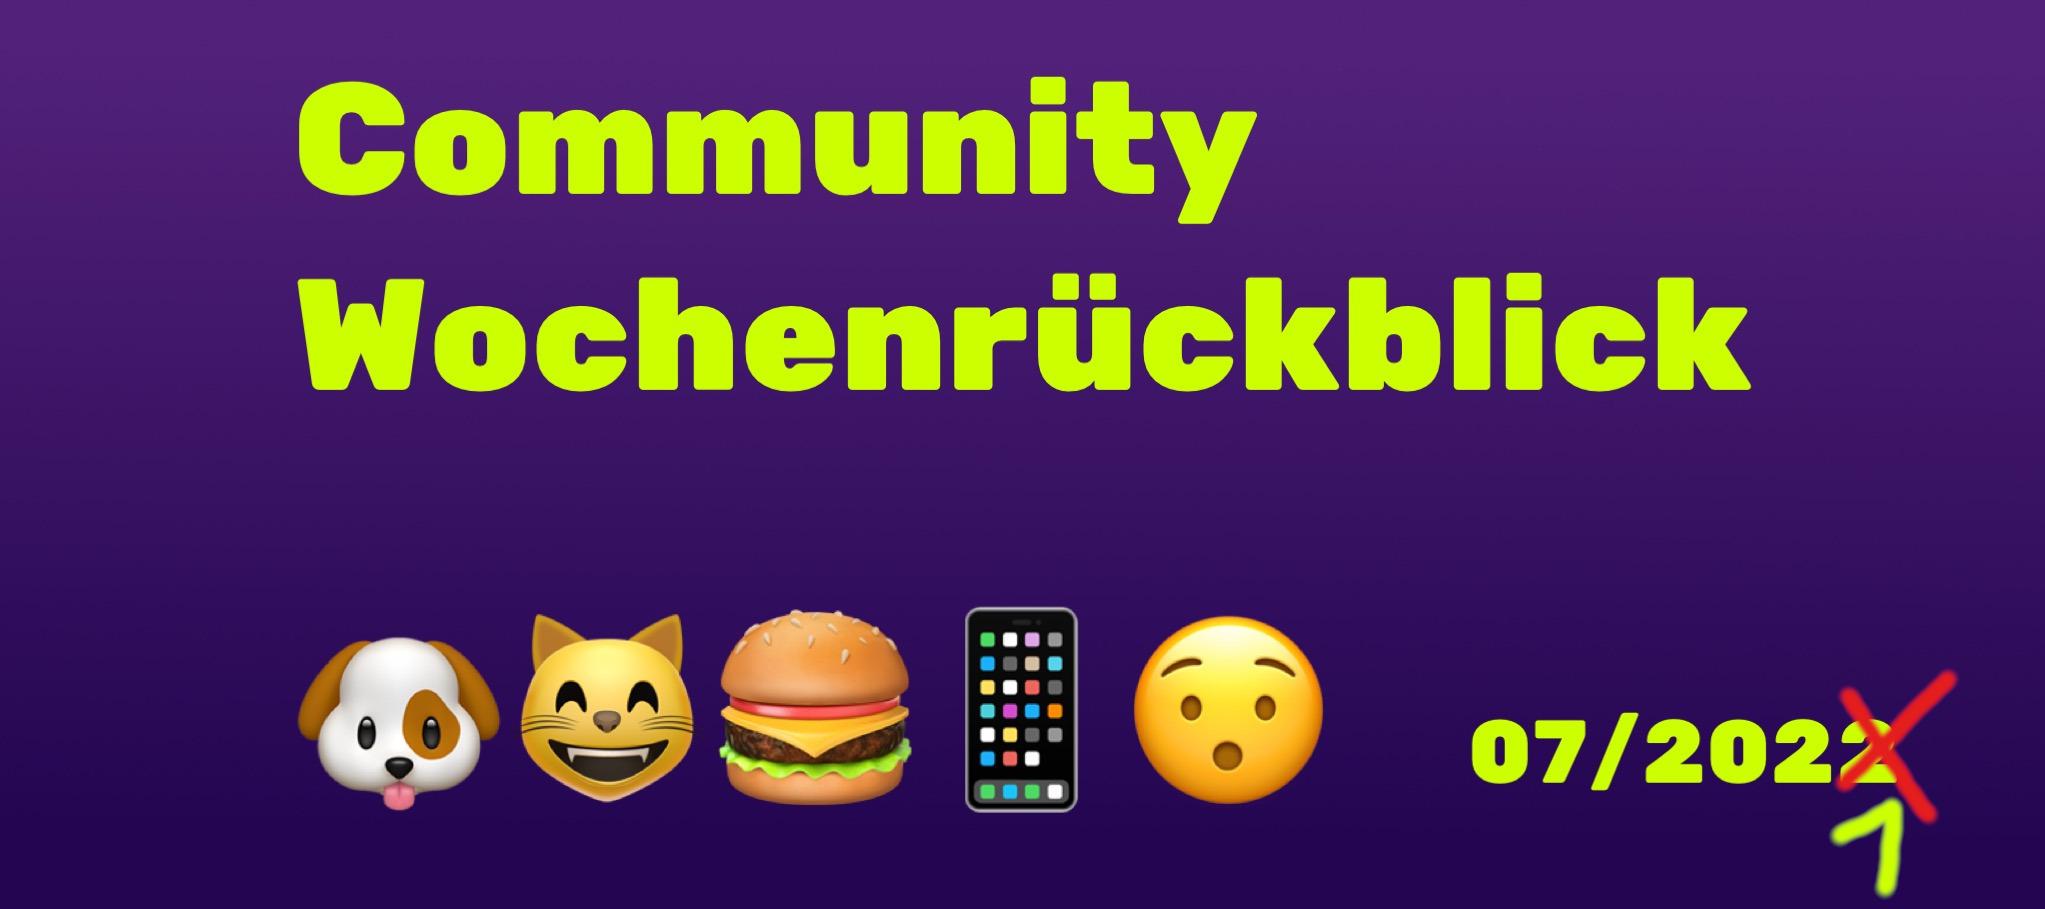 Community Wochenrückblick #07/2021